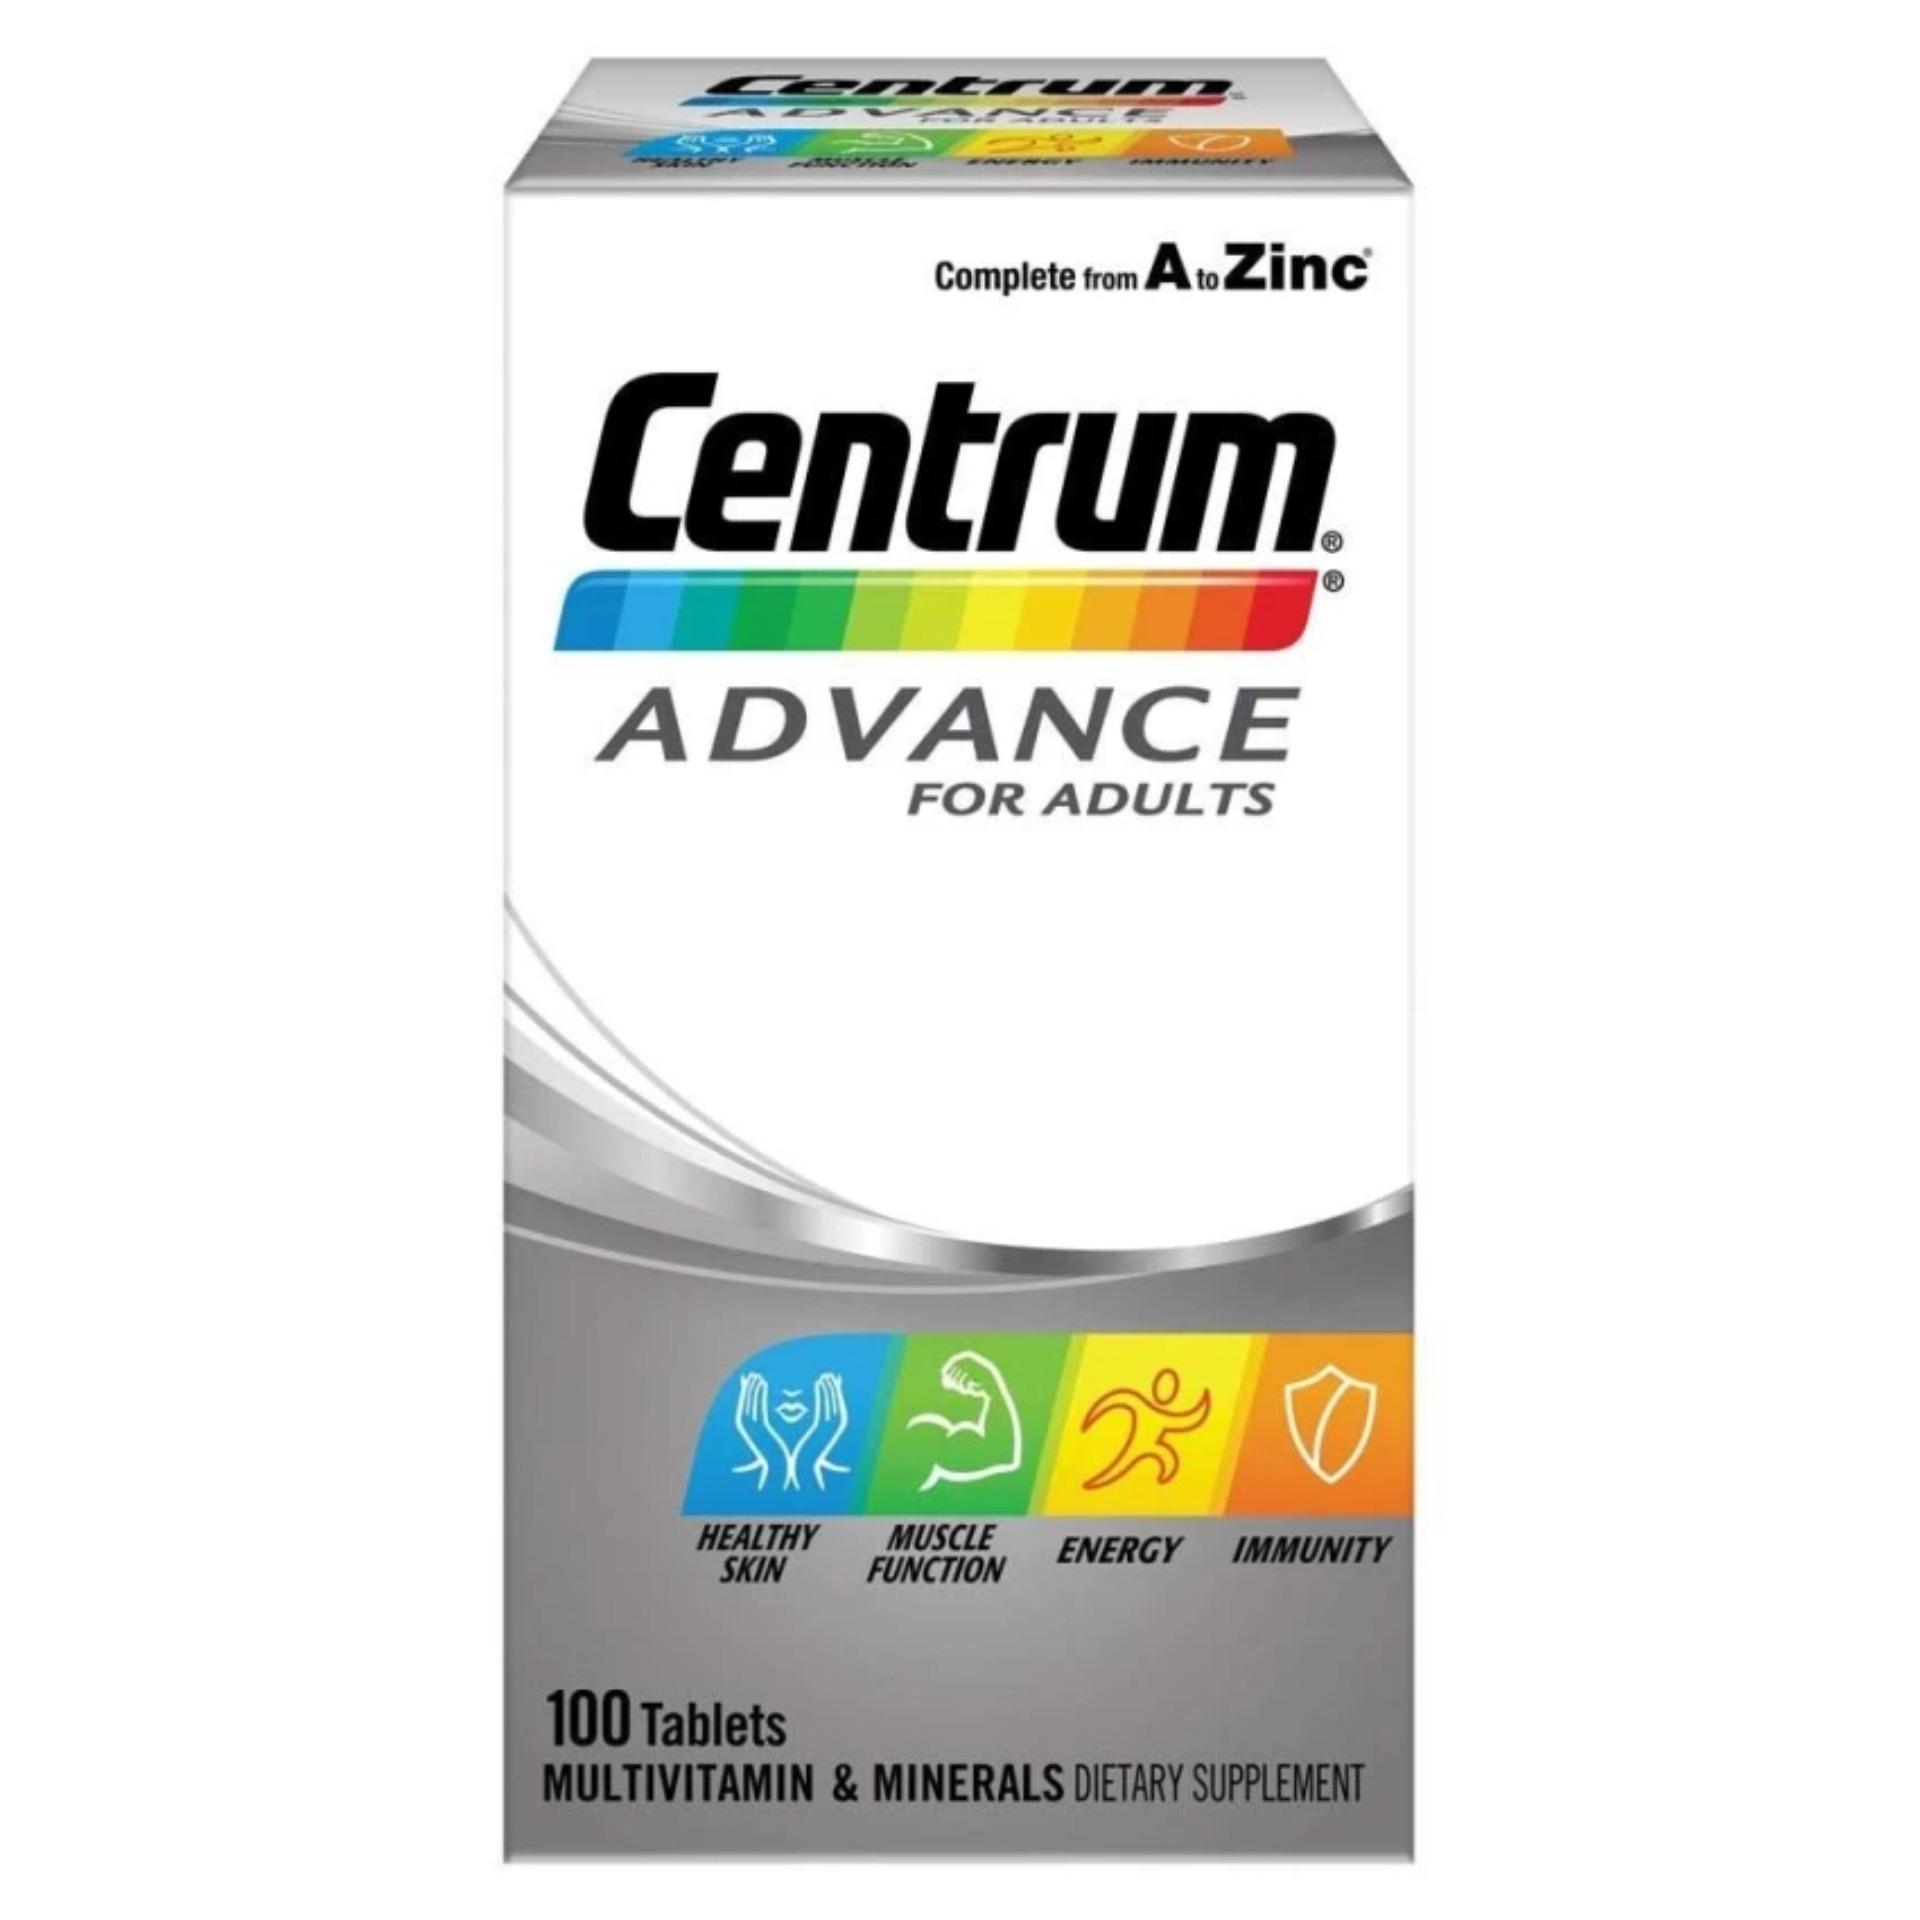 Konimex Renovit 30s Multivitamin Mineral Vitamin Capek Centrum Advance For Adult 100 Tablet Mulivitamin Australia